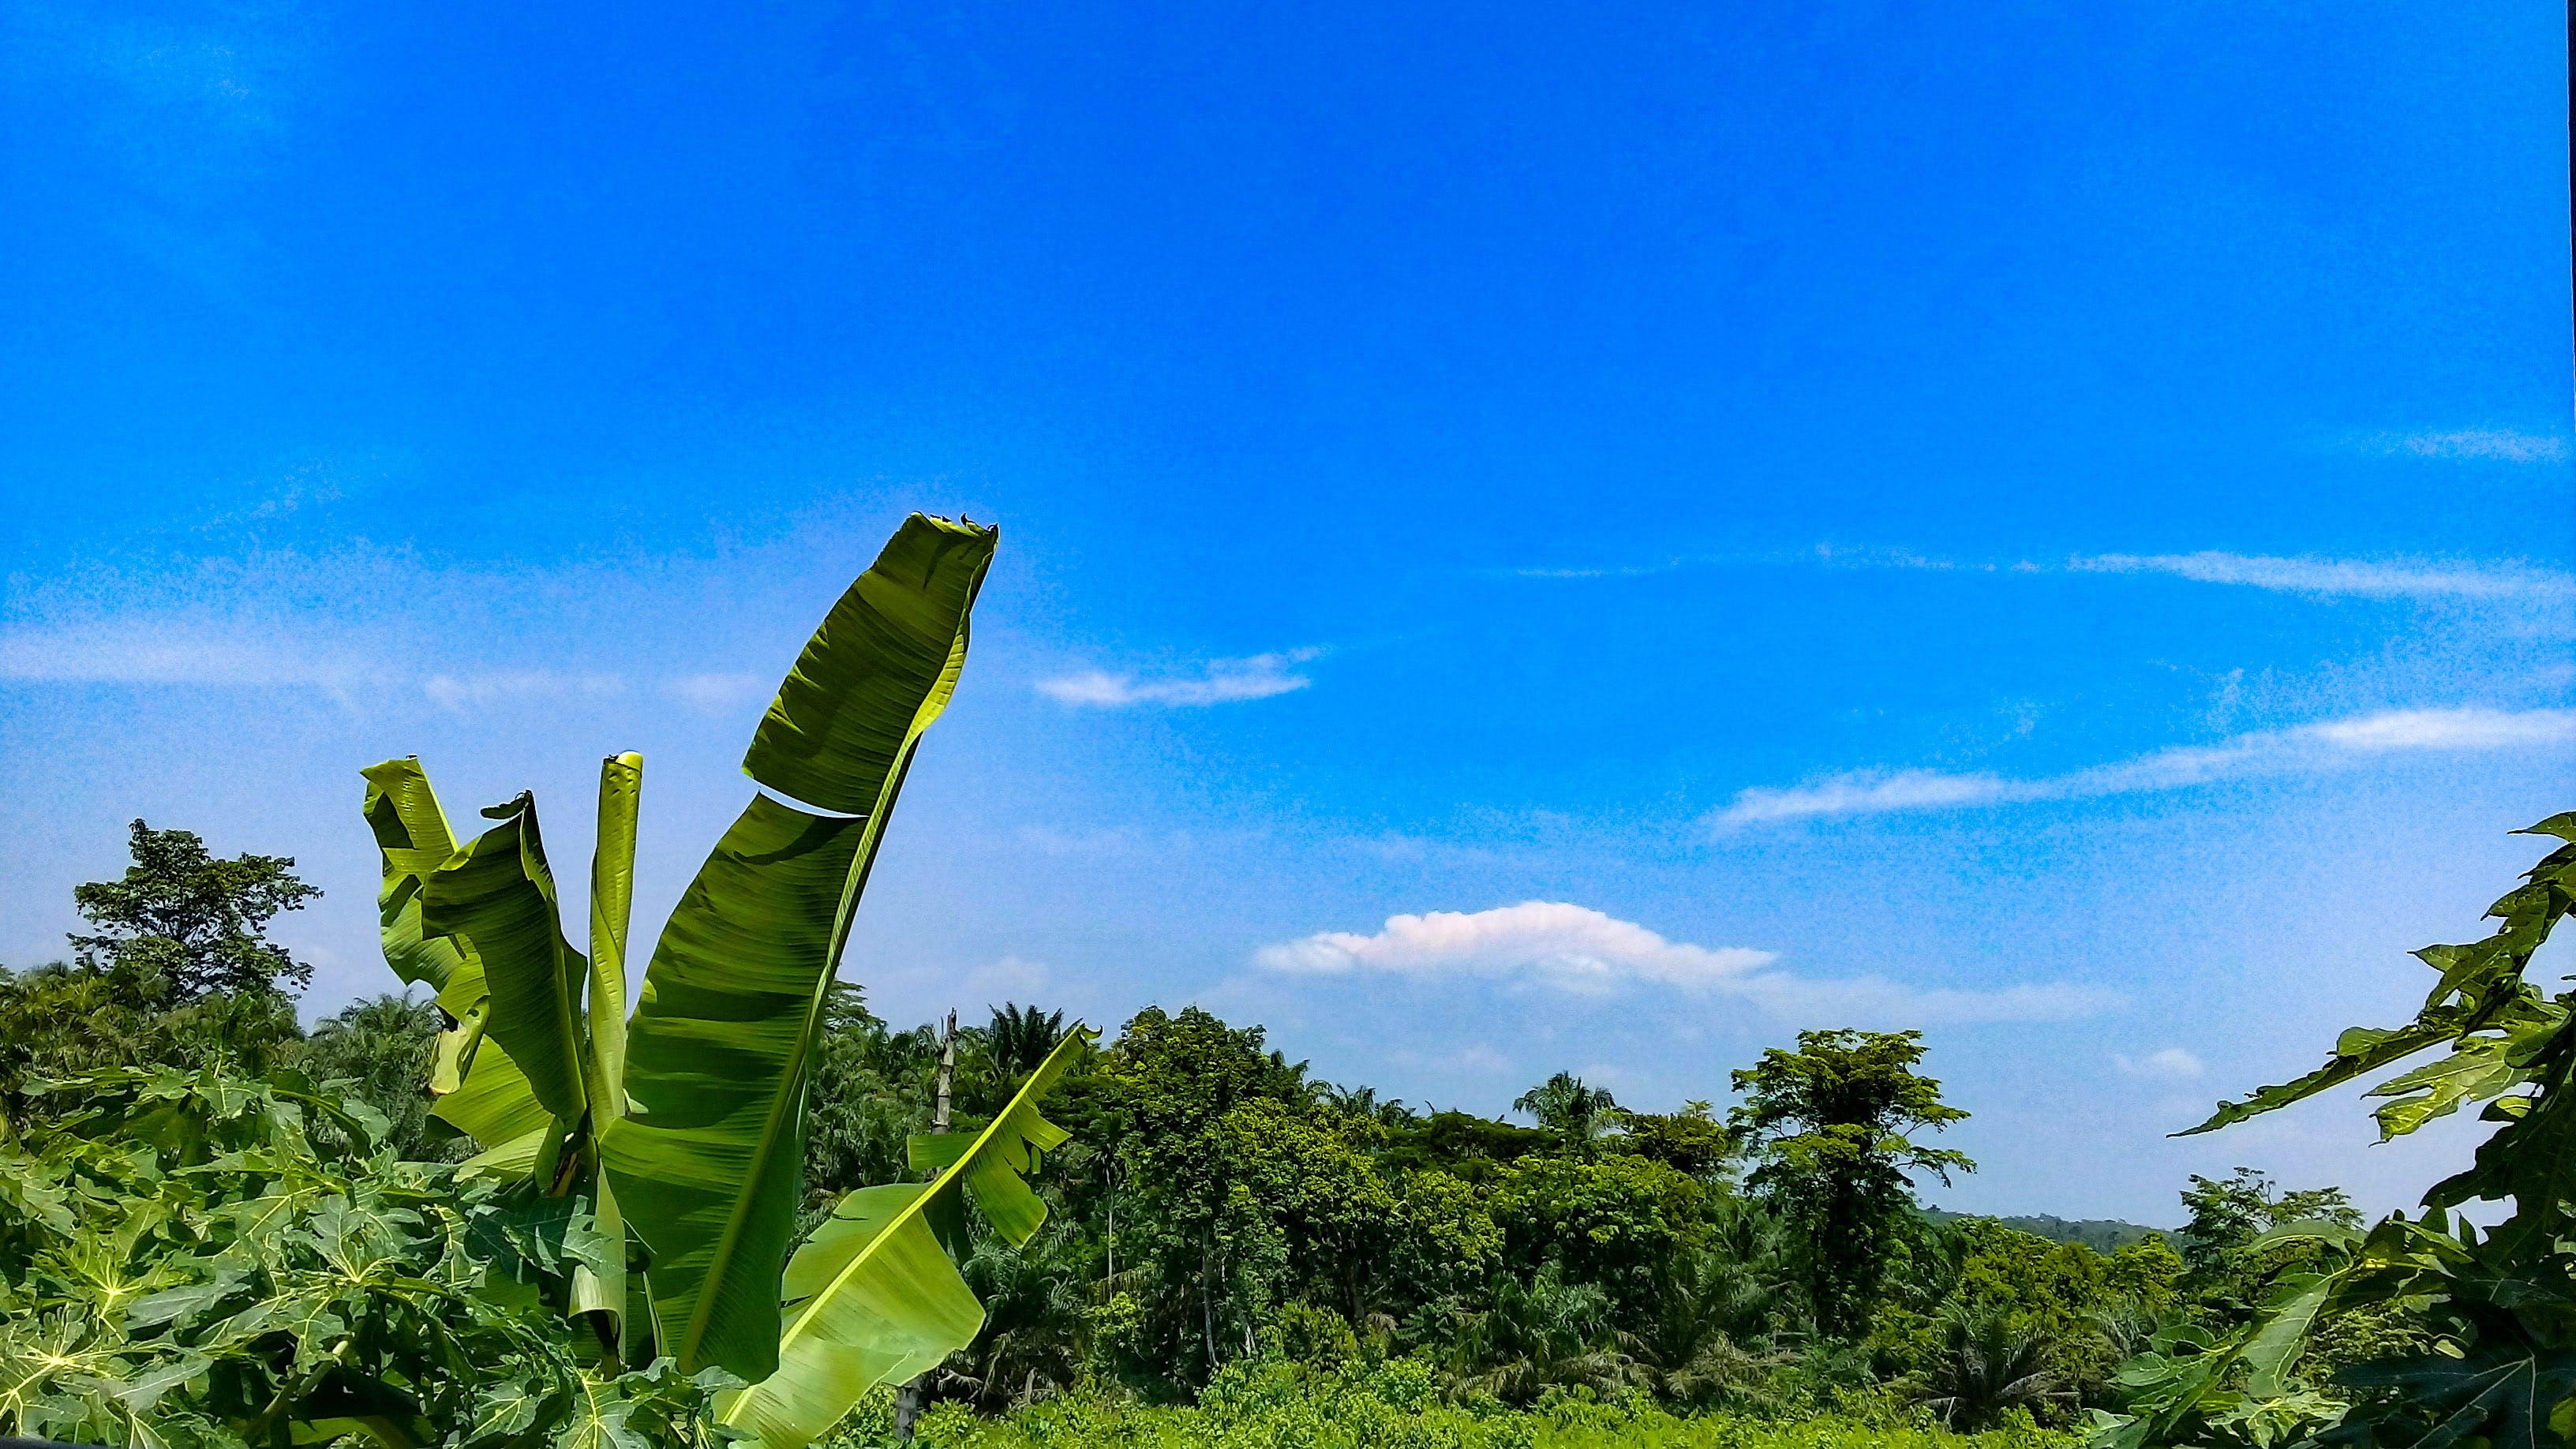 Free stock photo of nature, sky, photography, blue sky